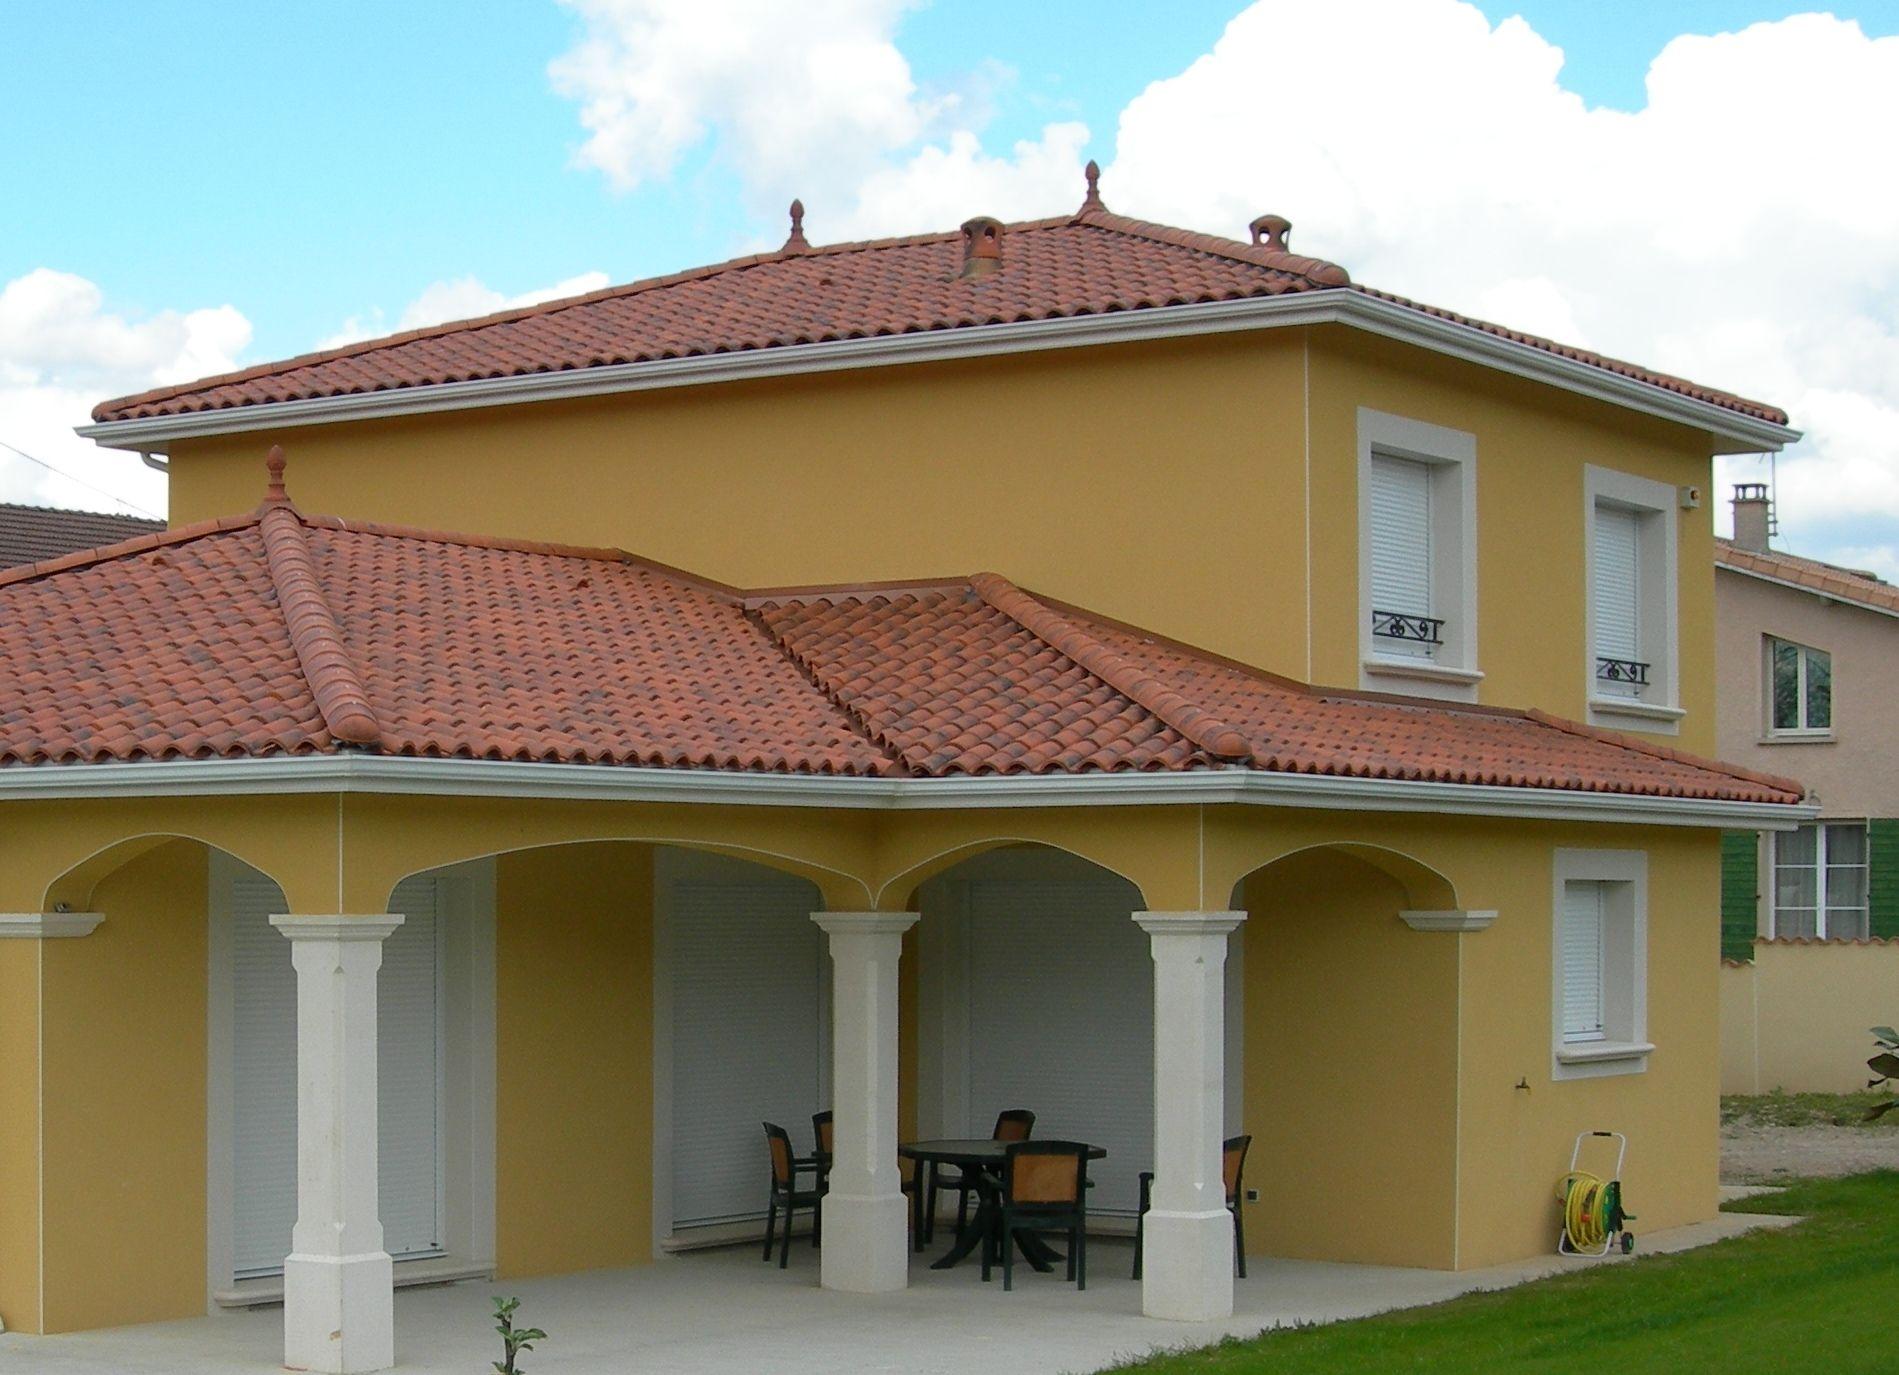 pilier de soutenement de terrasse en